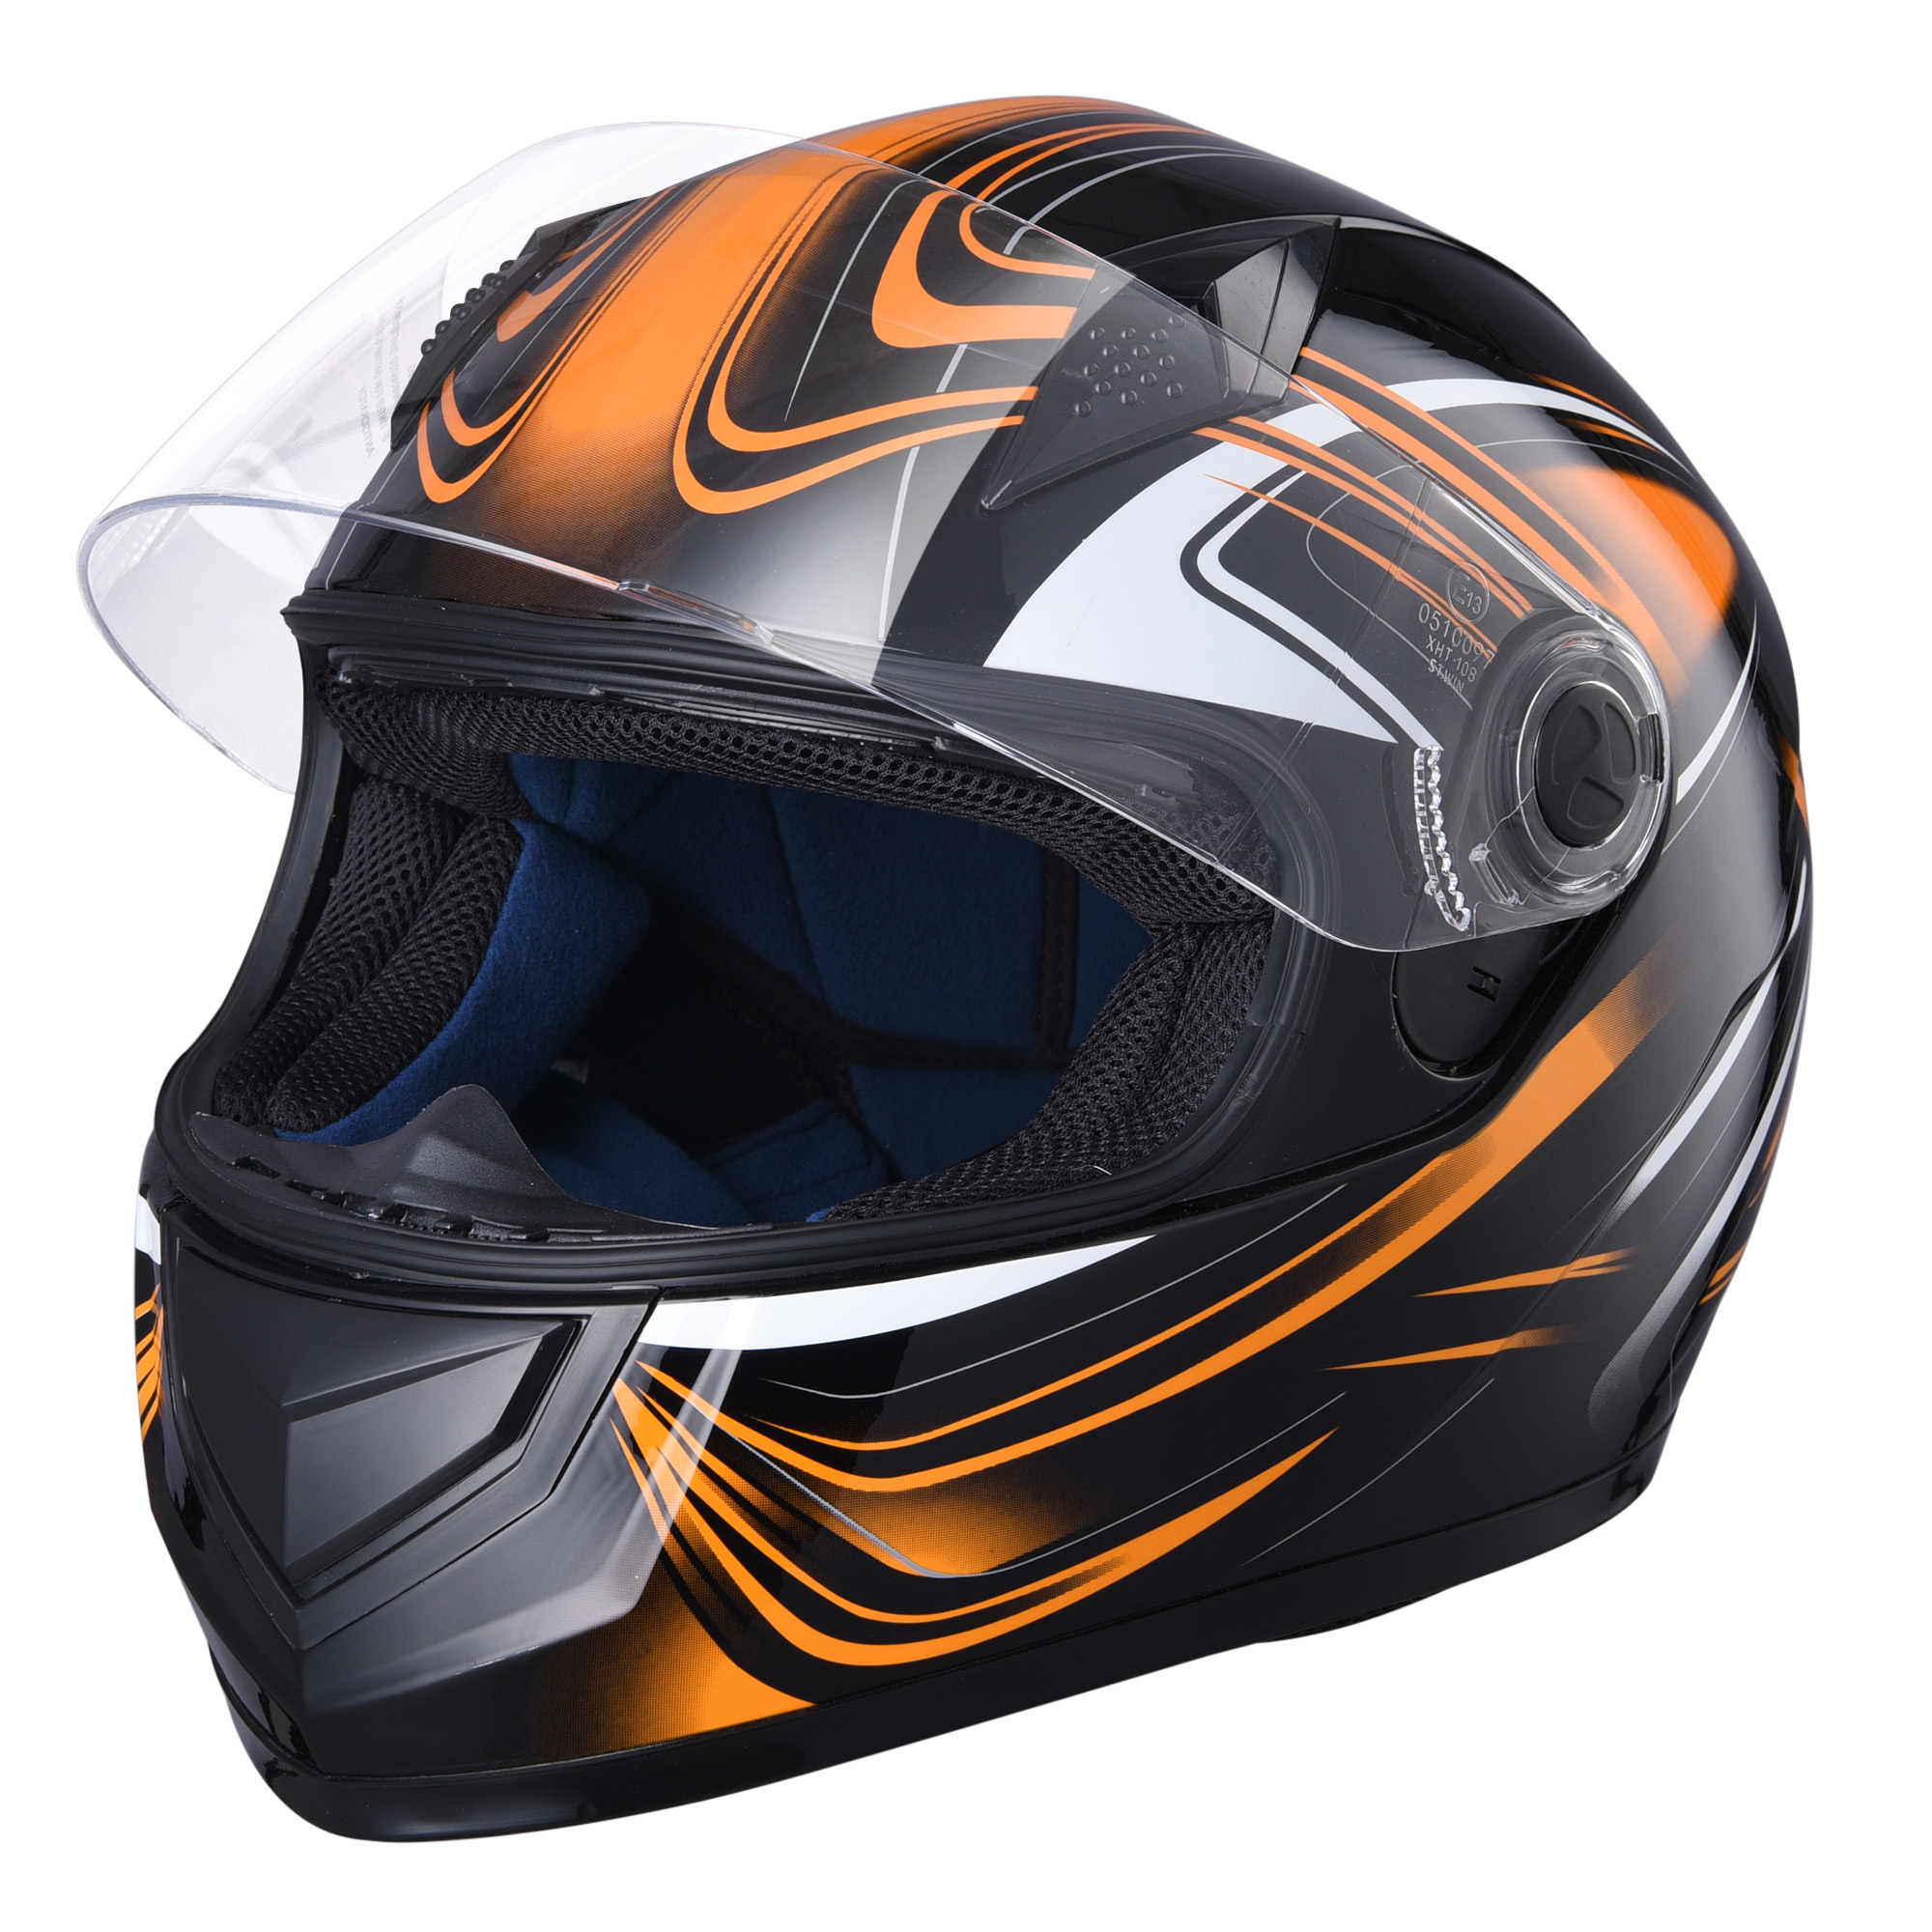 miniature 110 - AHR K12 Full Face Motorcycle Helmet DOT Air Vents Clear Visor Racing S M L XL